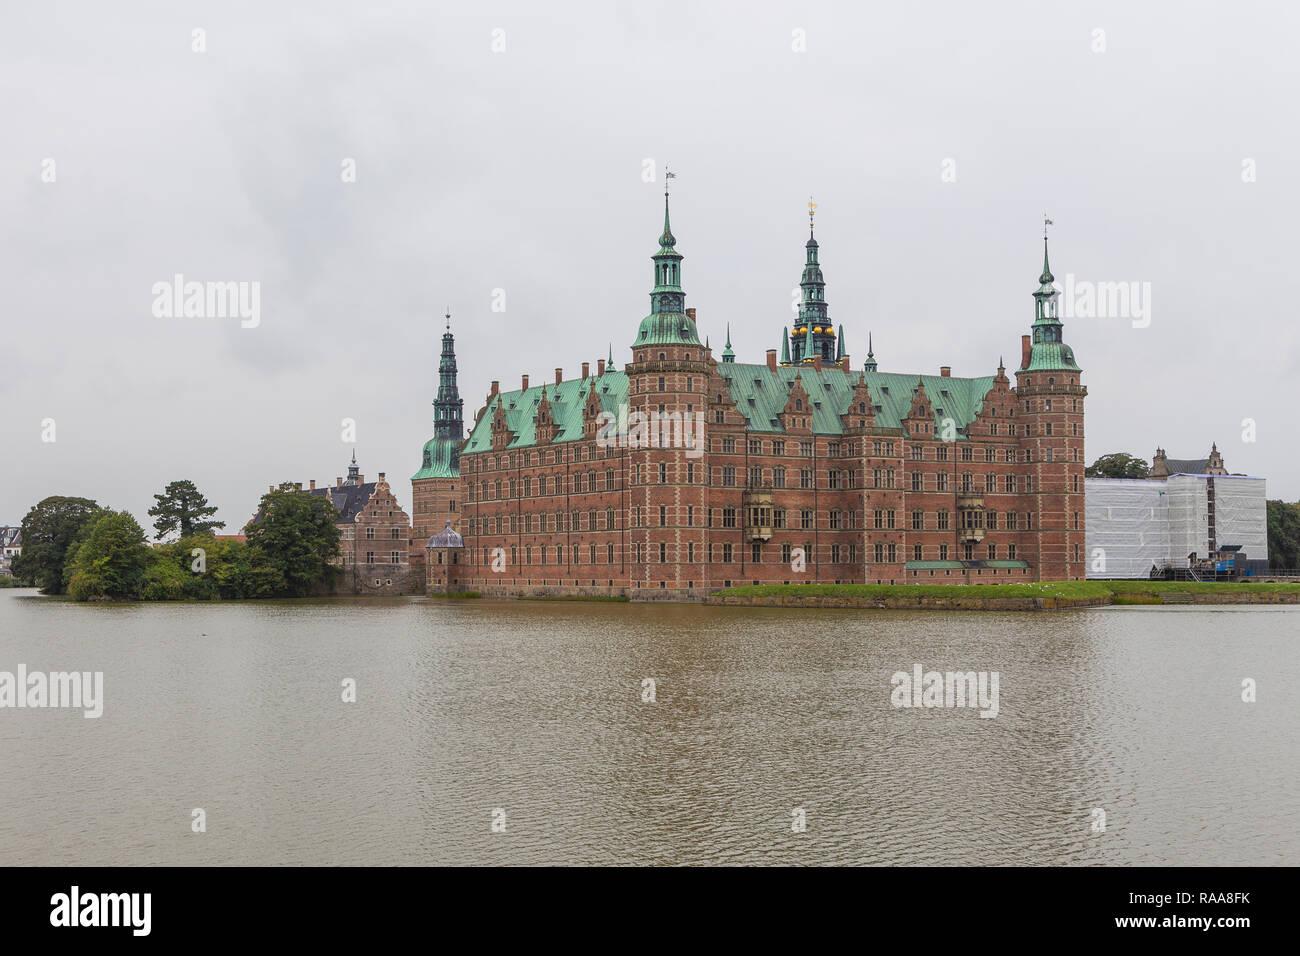 Frederiksborg, Hillerod, Denmark- 30 August 2014: Frederiksborg Palace, palatial complex in Hillerod. The largest Renaissance residence in Scandinavia - Stock Image